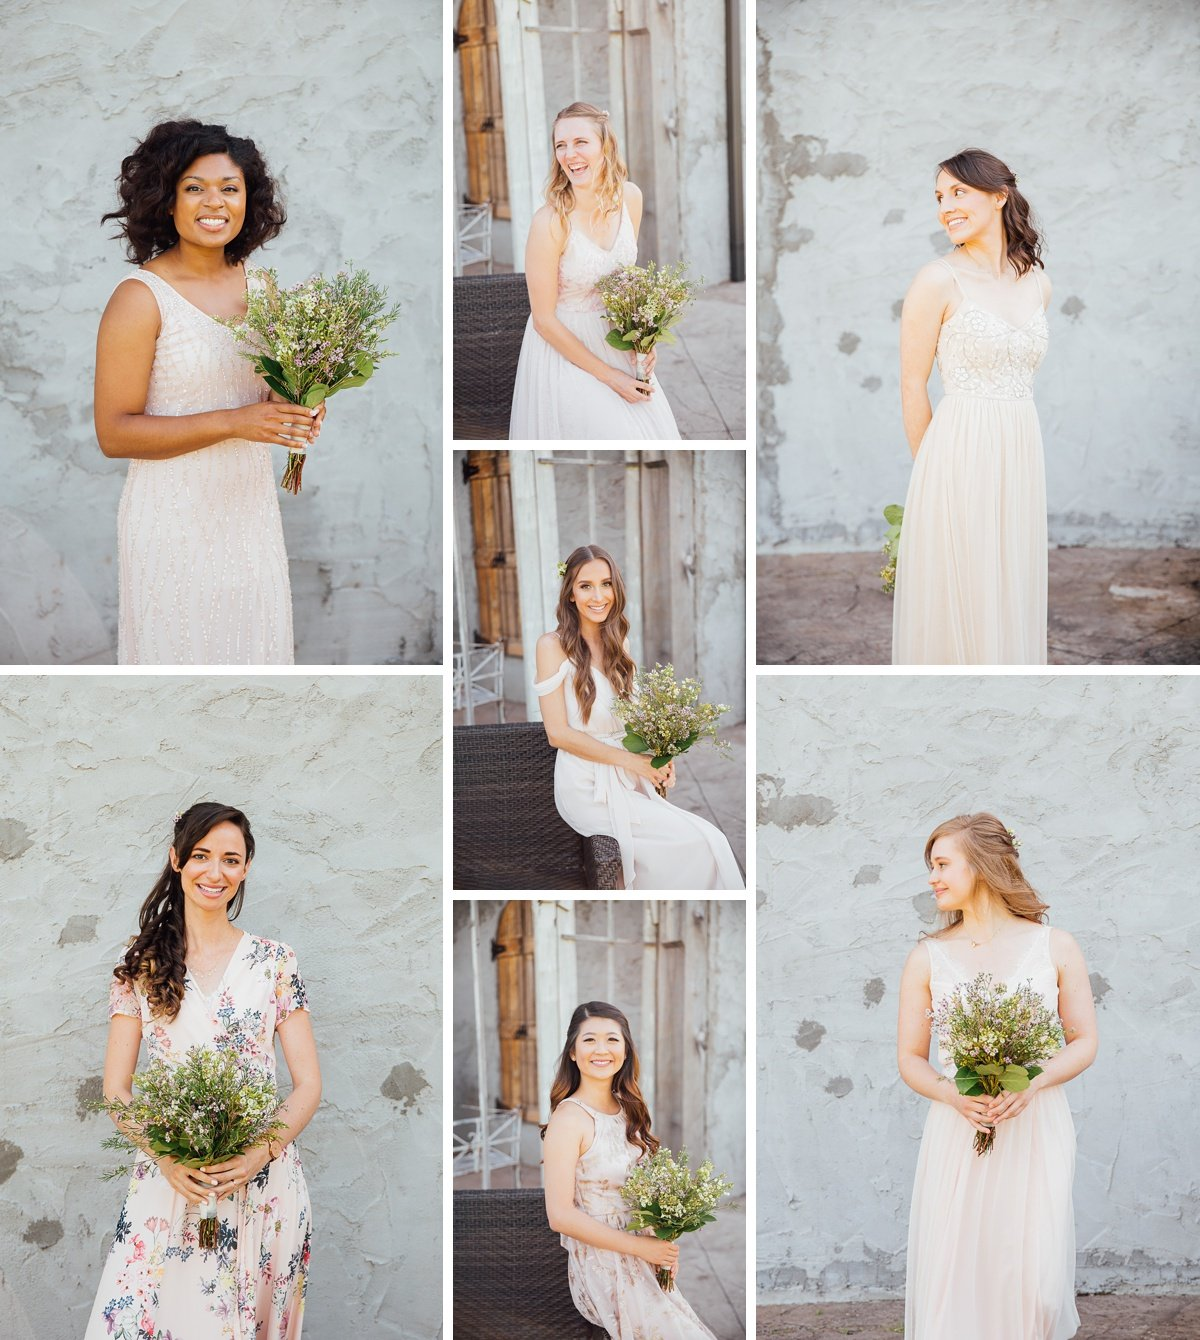 bridesmaids-portraits-creative-1 Cason's Cove Alvaton, KY | Nicole + Austin